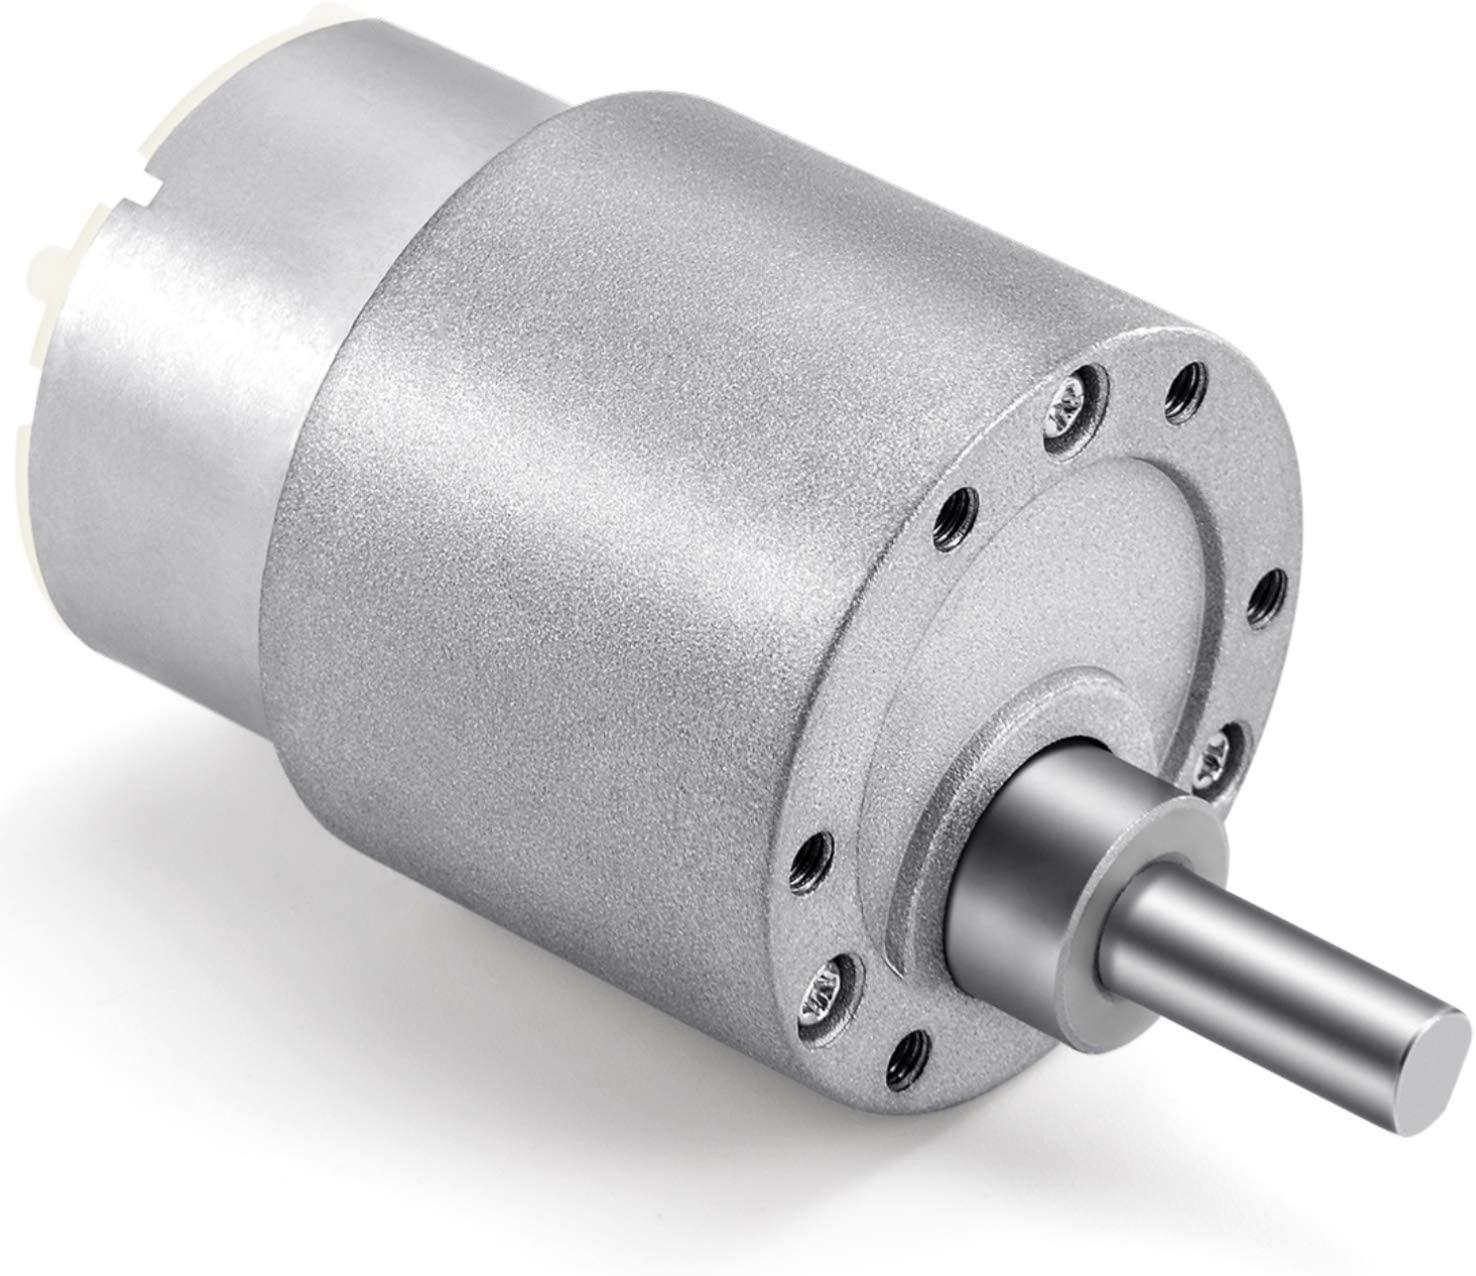 Kohree High Torque DC Motor, 12V 60 RPM Electric Gear Box 37mm Centric Output Shaft Gearbox Motor